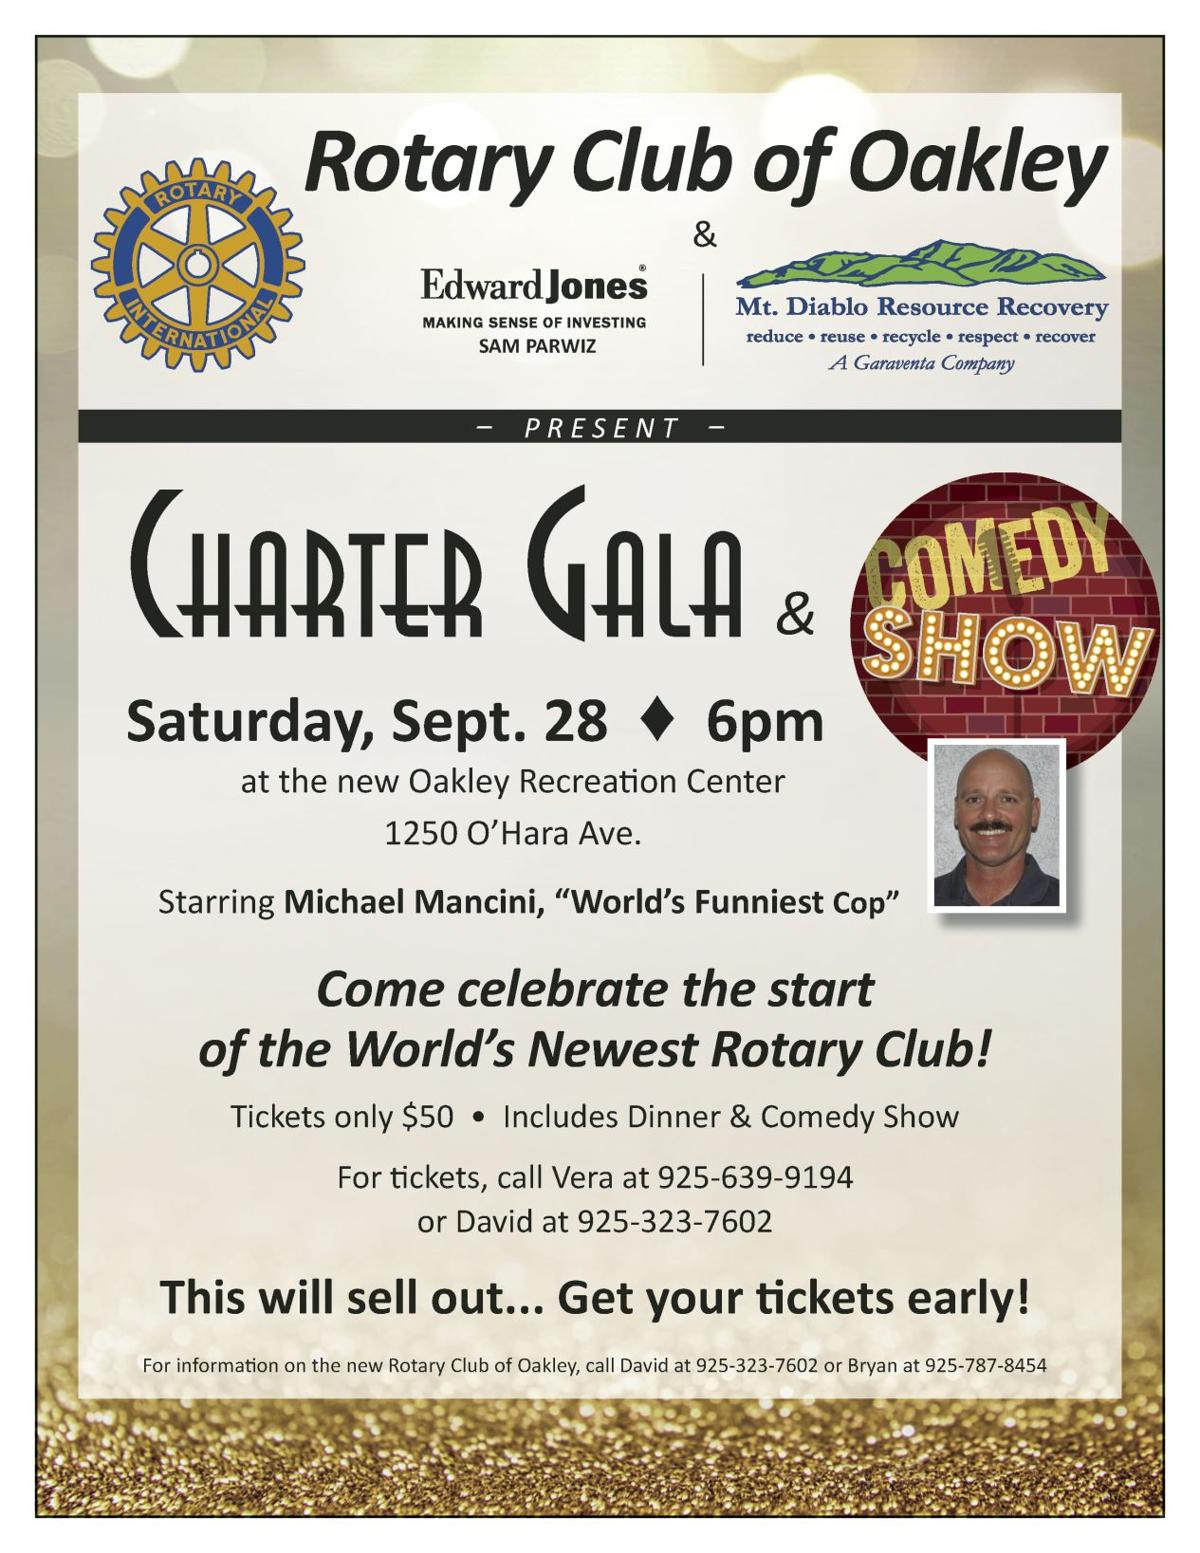 Rotary Club of Oakley Charter Gala